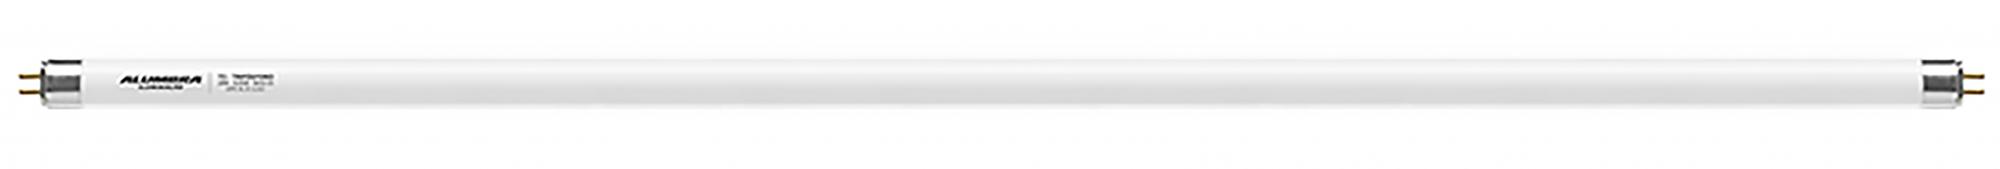 Lâmpada Fluorescente Tubular T5 28W 4.000k